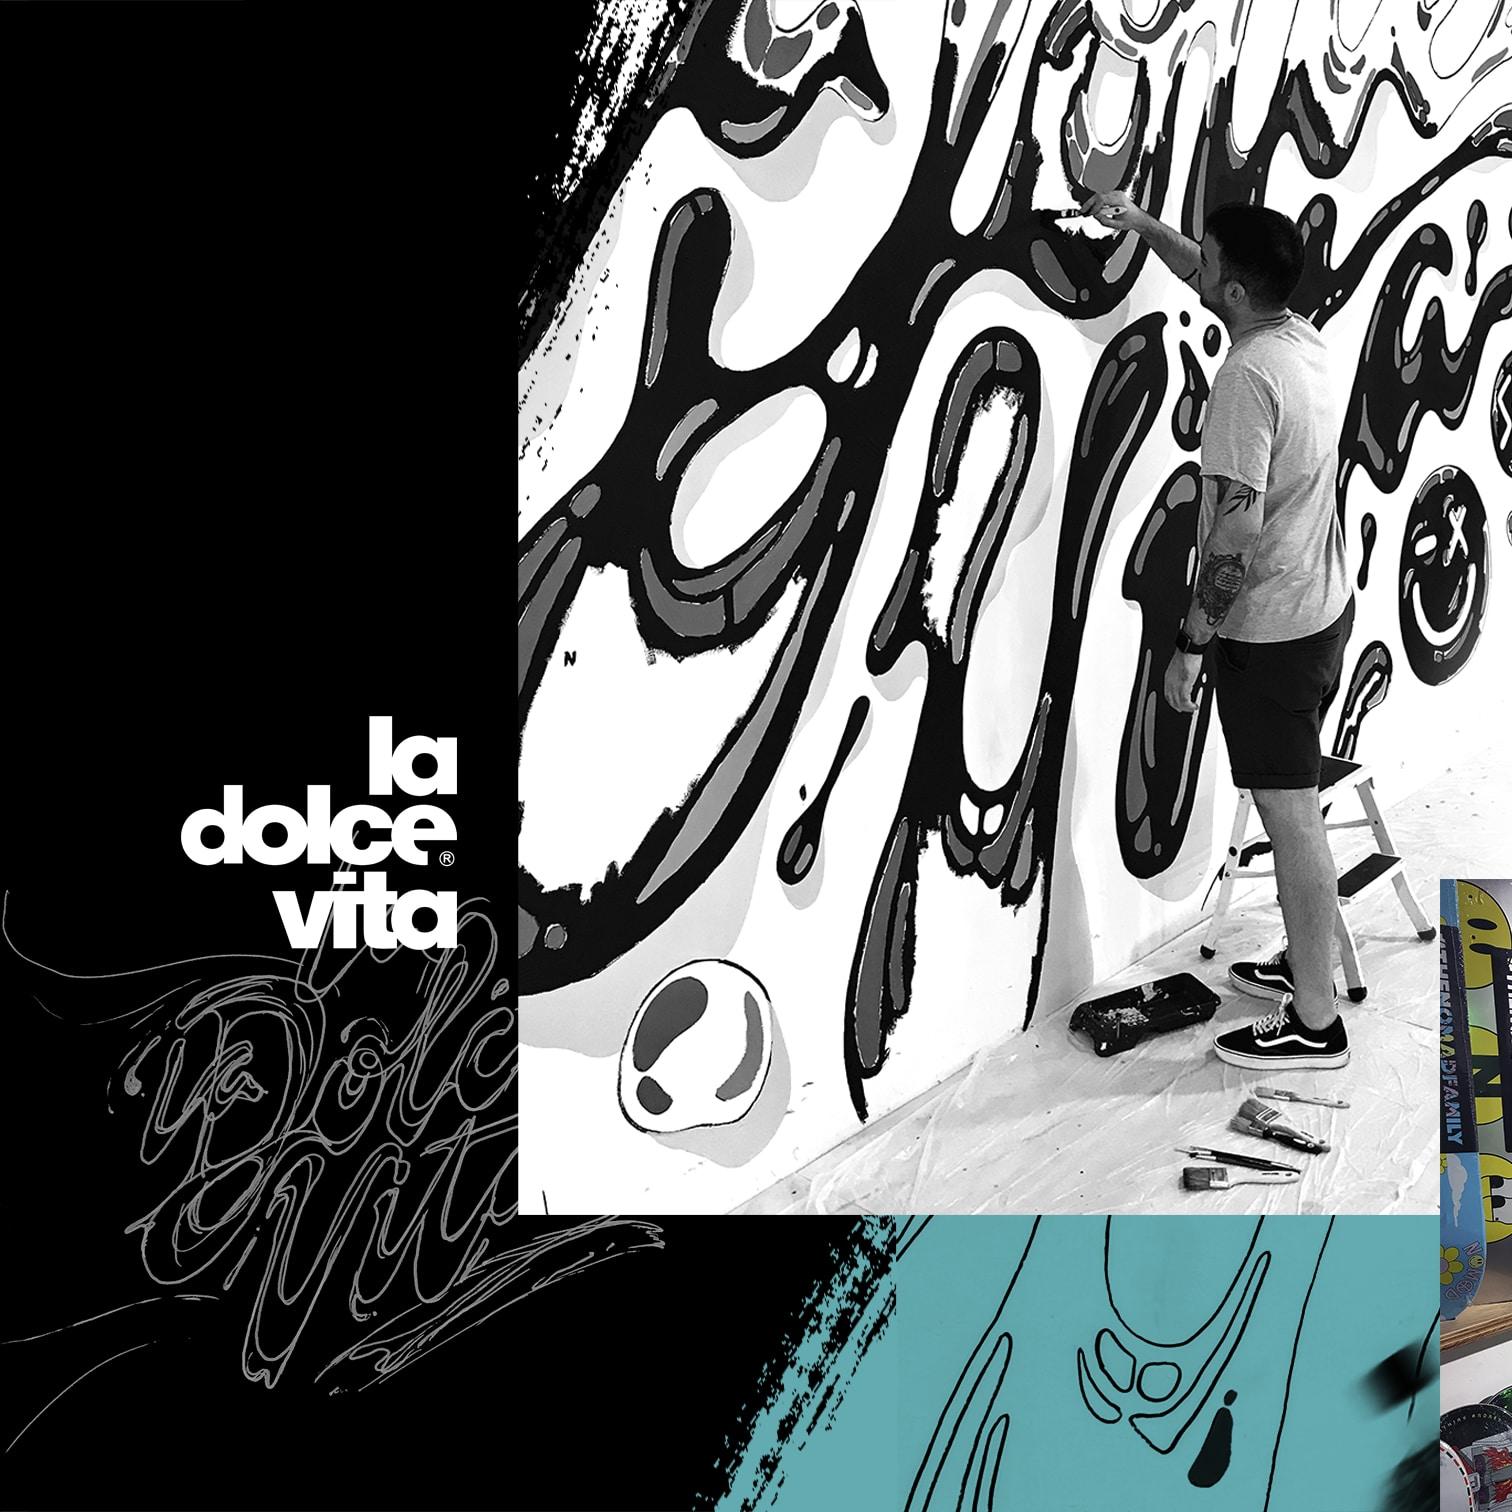 siroko-dolce-02